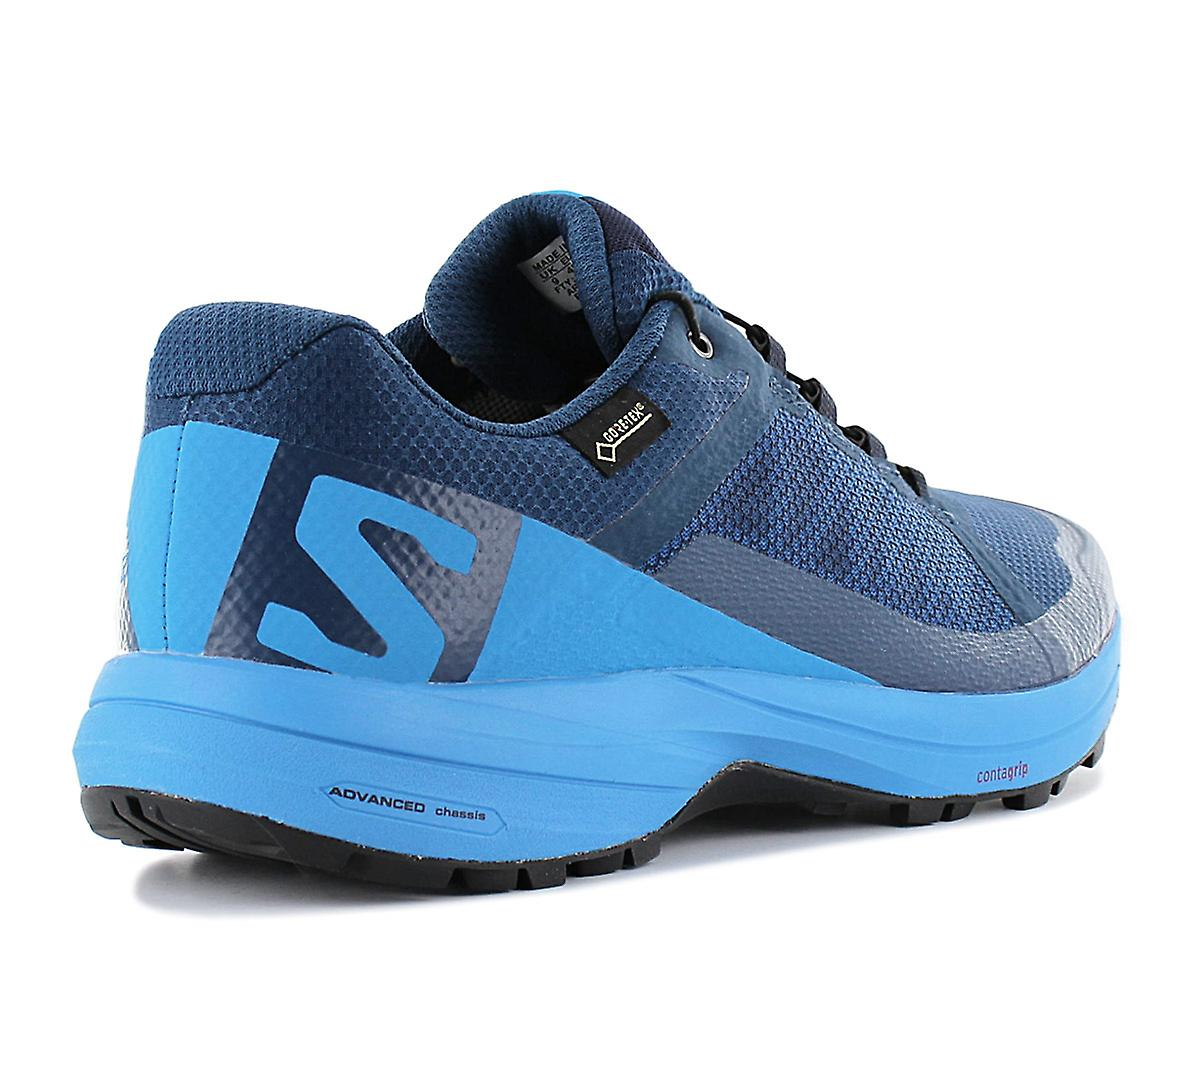 Salomon XA Élever GTX Gore-Tex 402398 Chaussures pour hommes Chaussures Bleues Chaussures de sport Chaussures de sport